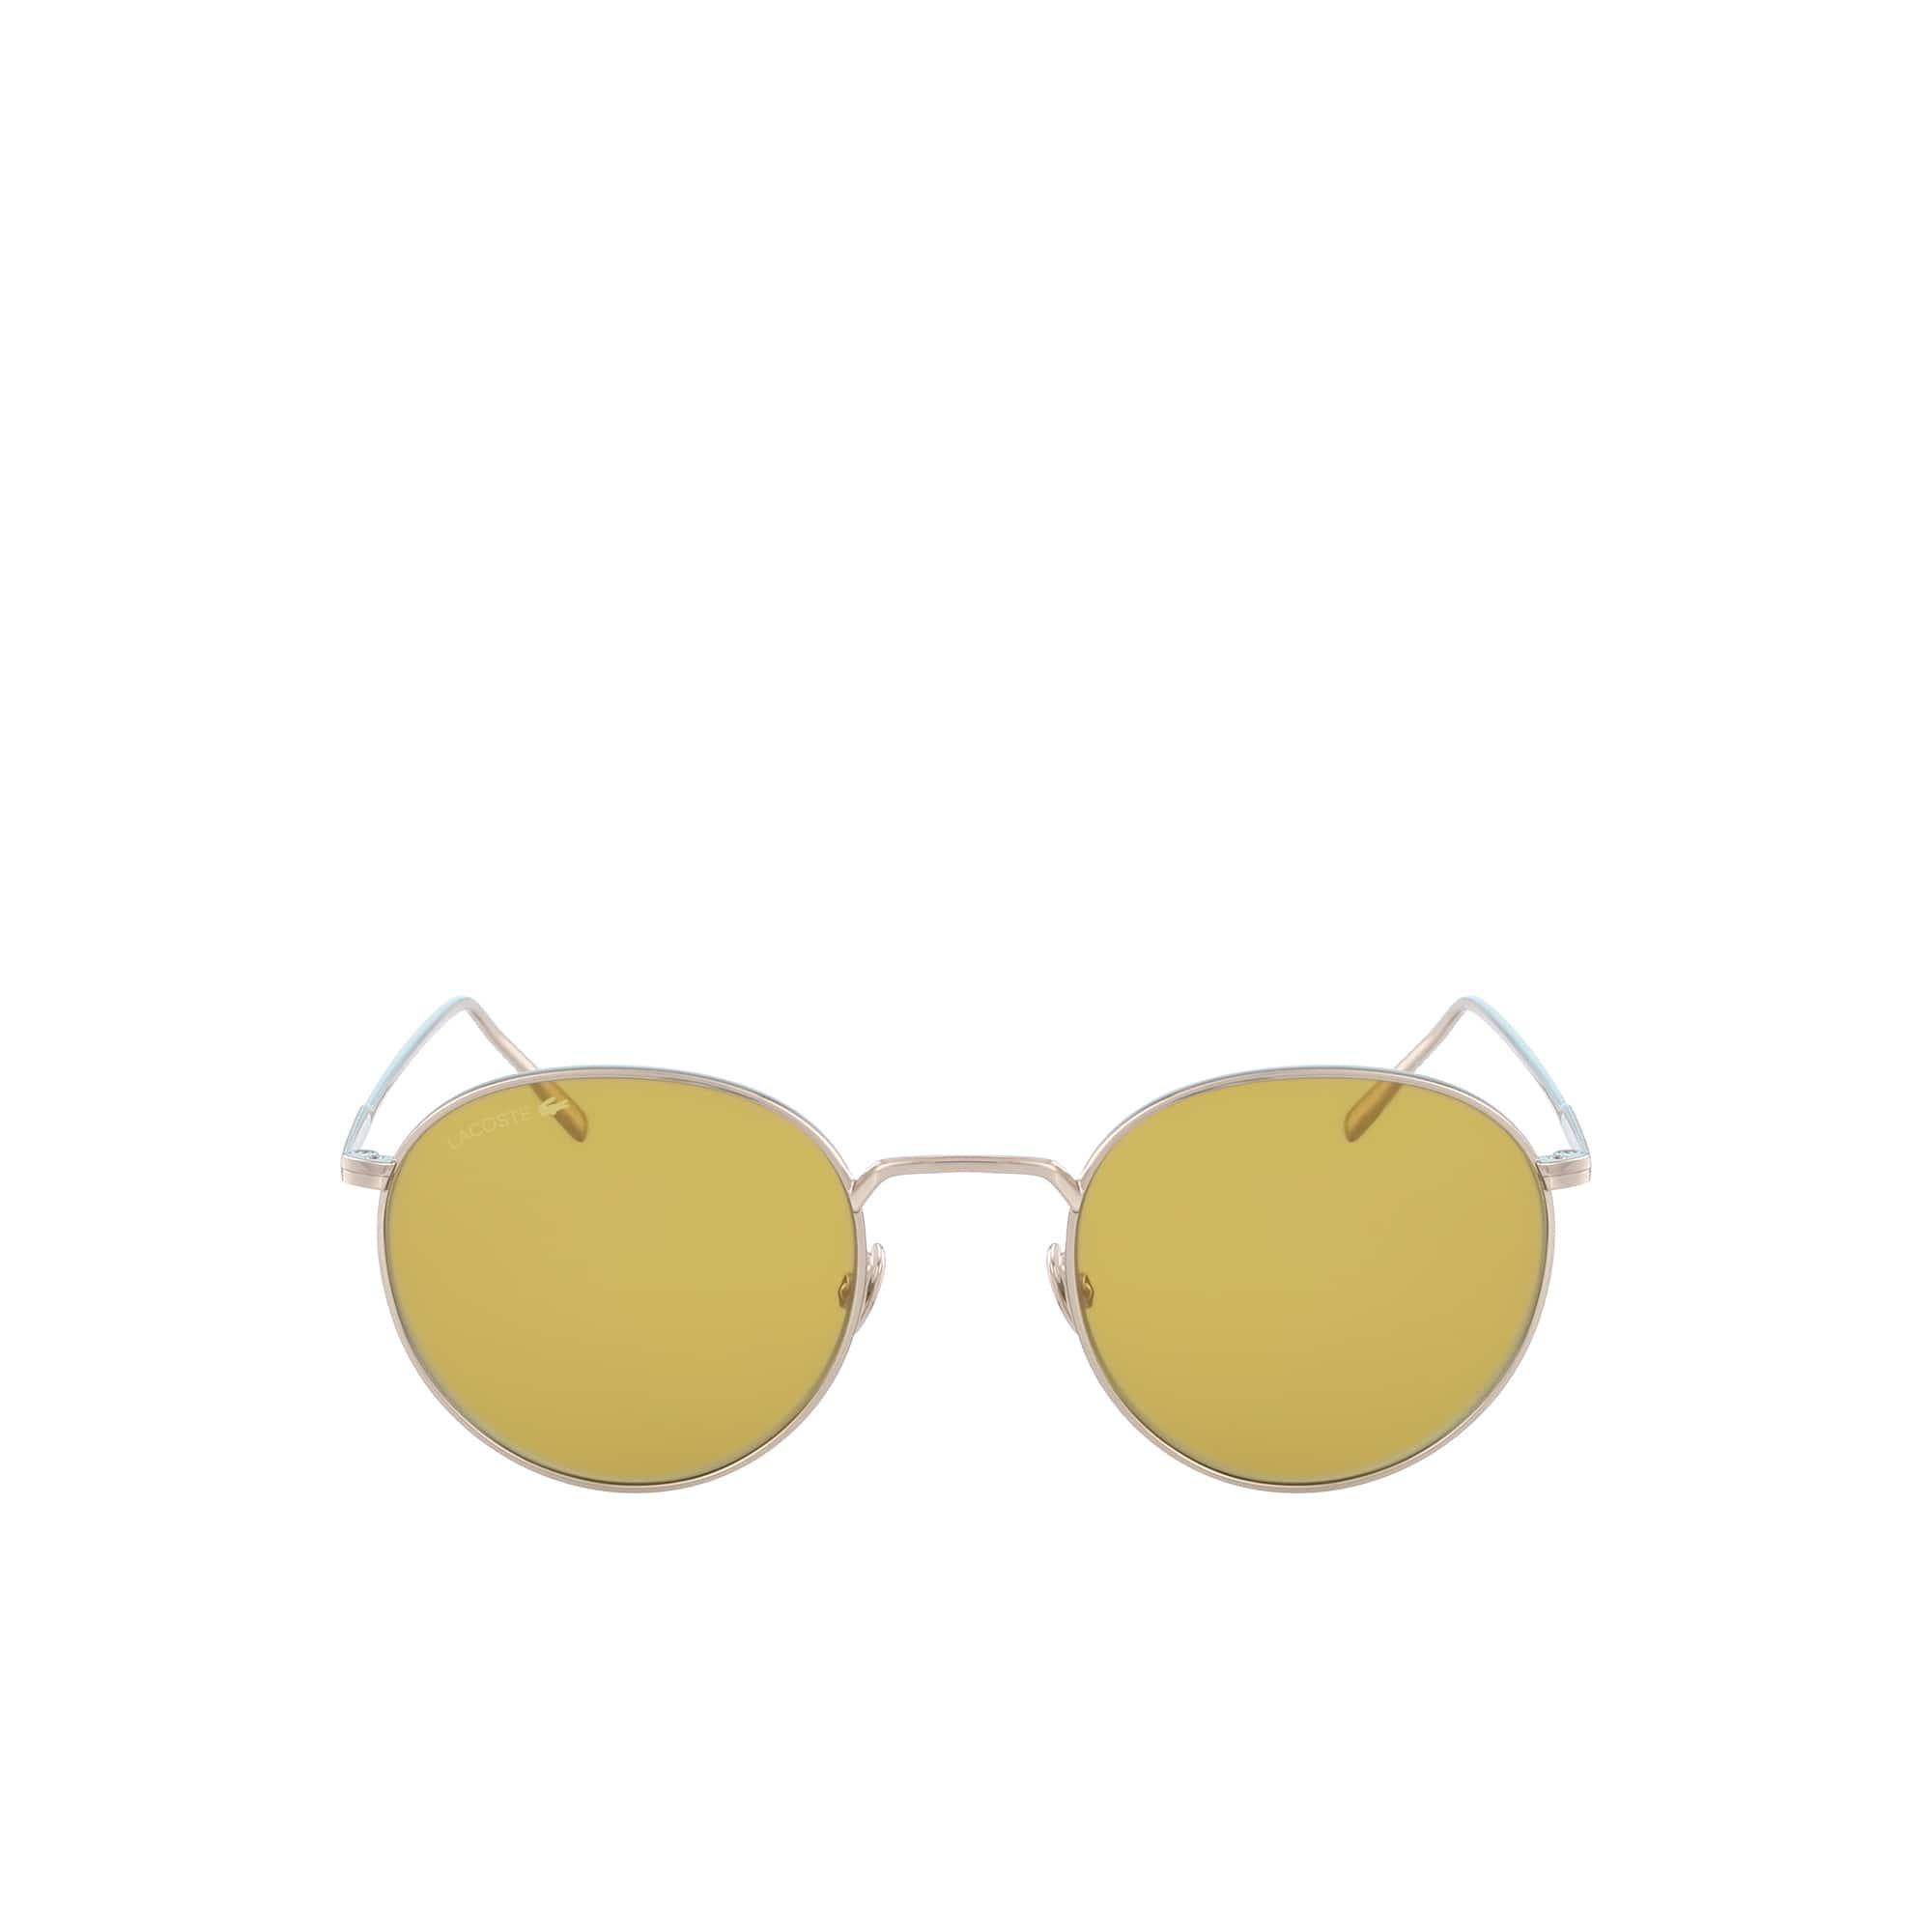 e8b4ef9749 Paris Collection. Metal Ultrathin Sunglasses